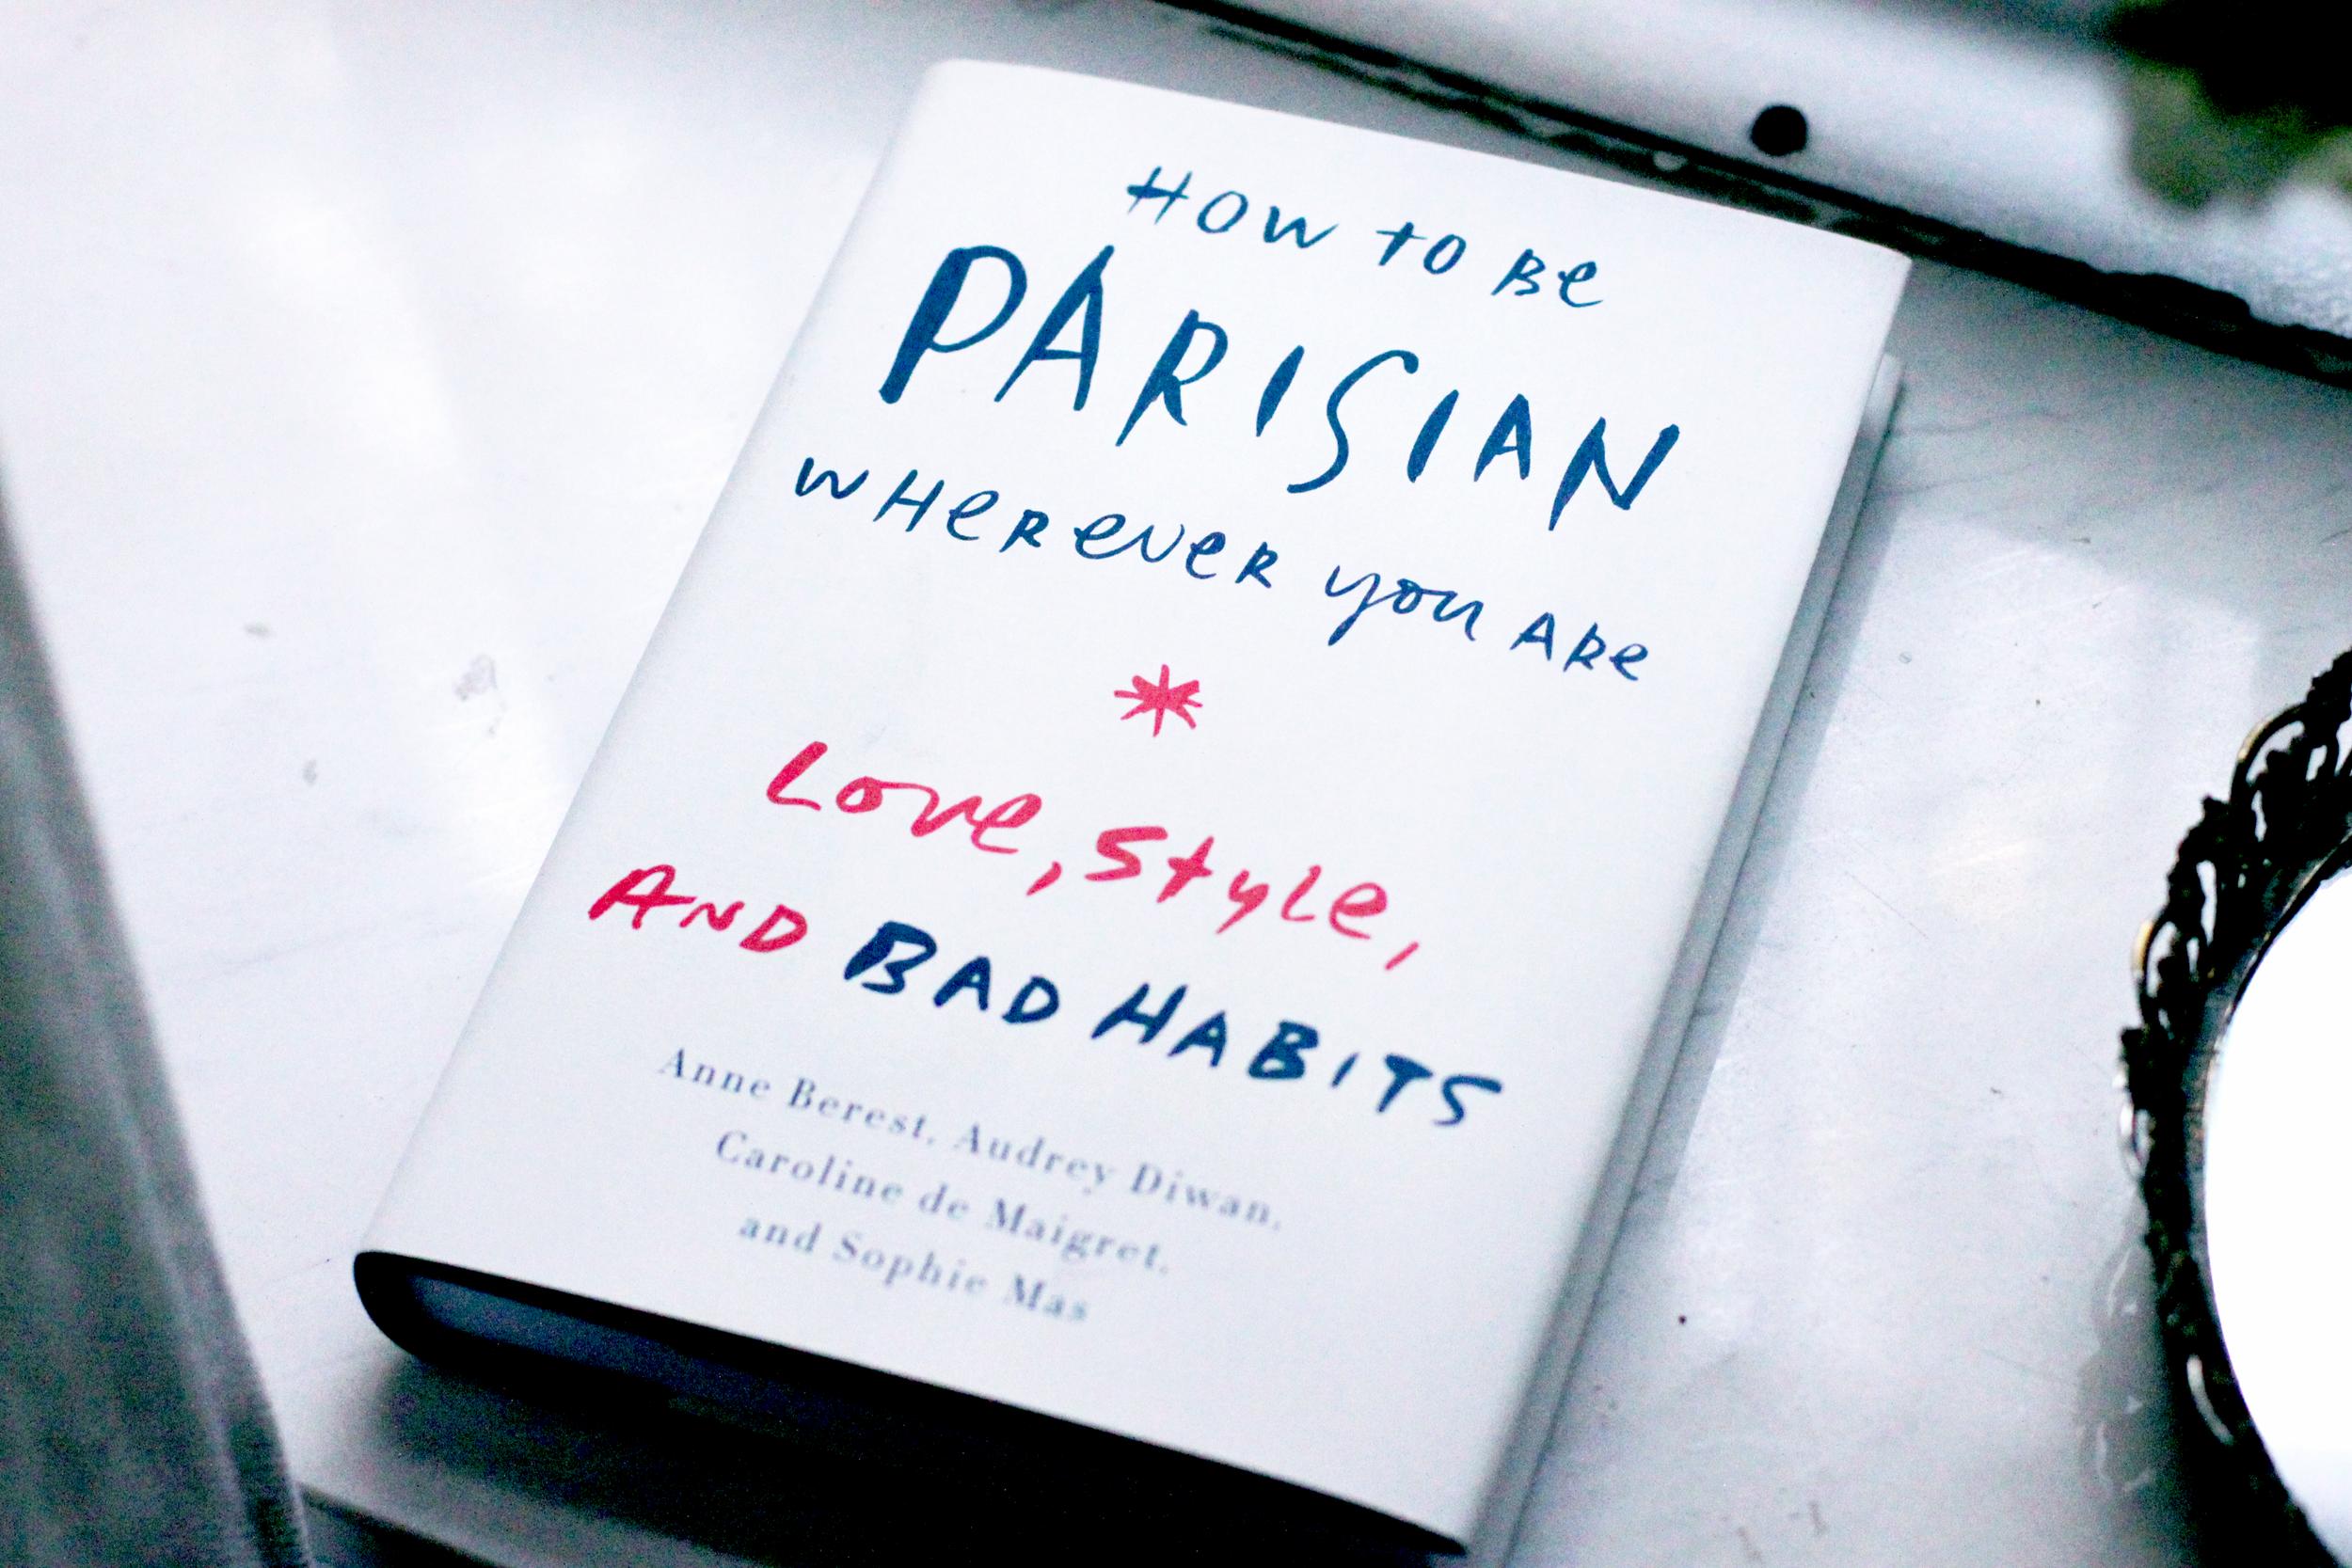 How to Be Parisian_JNSQ